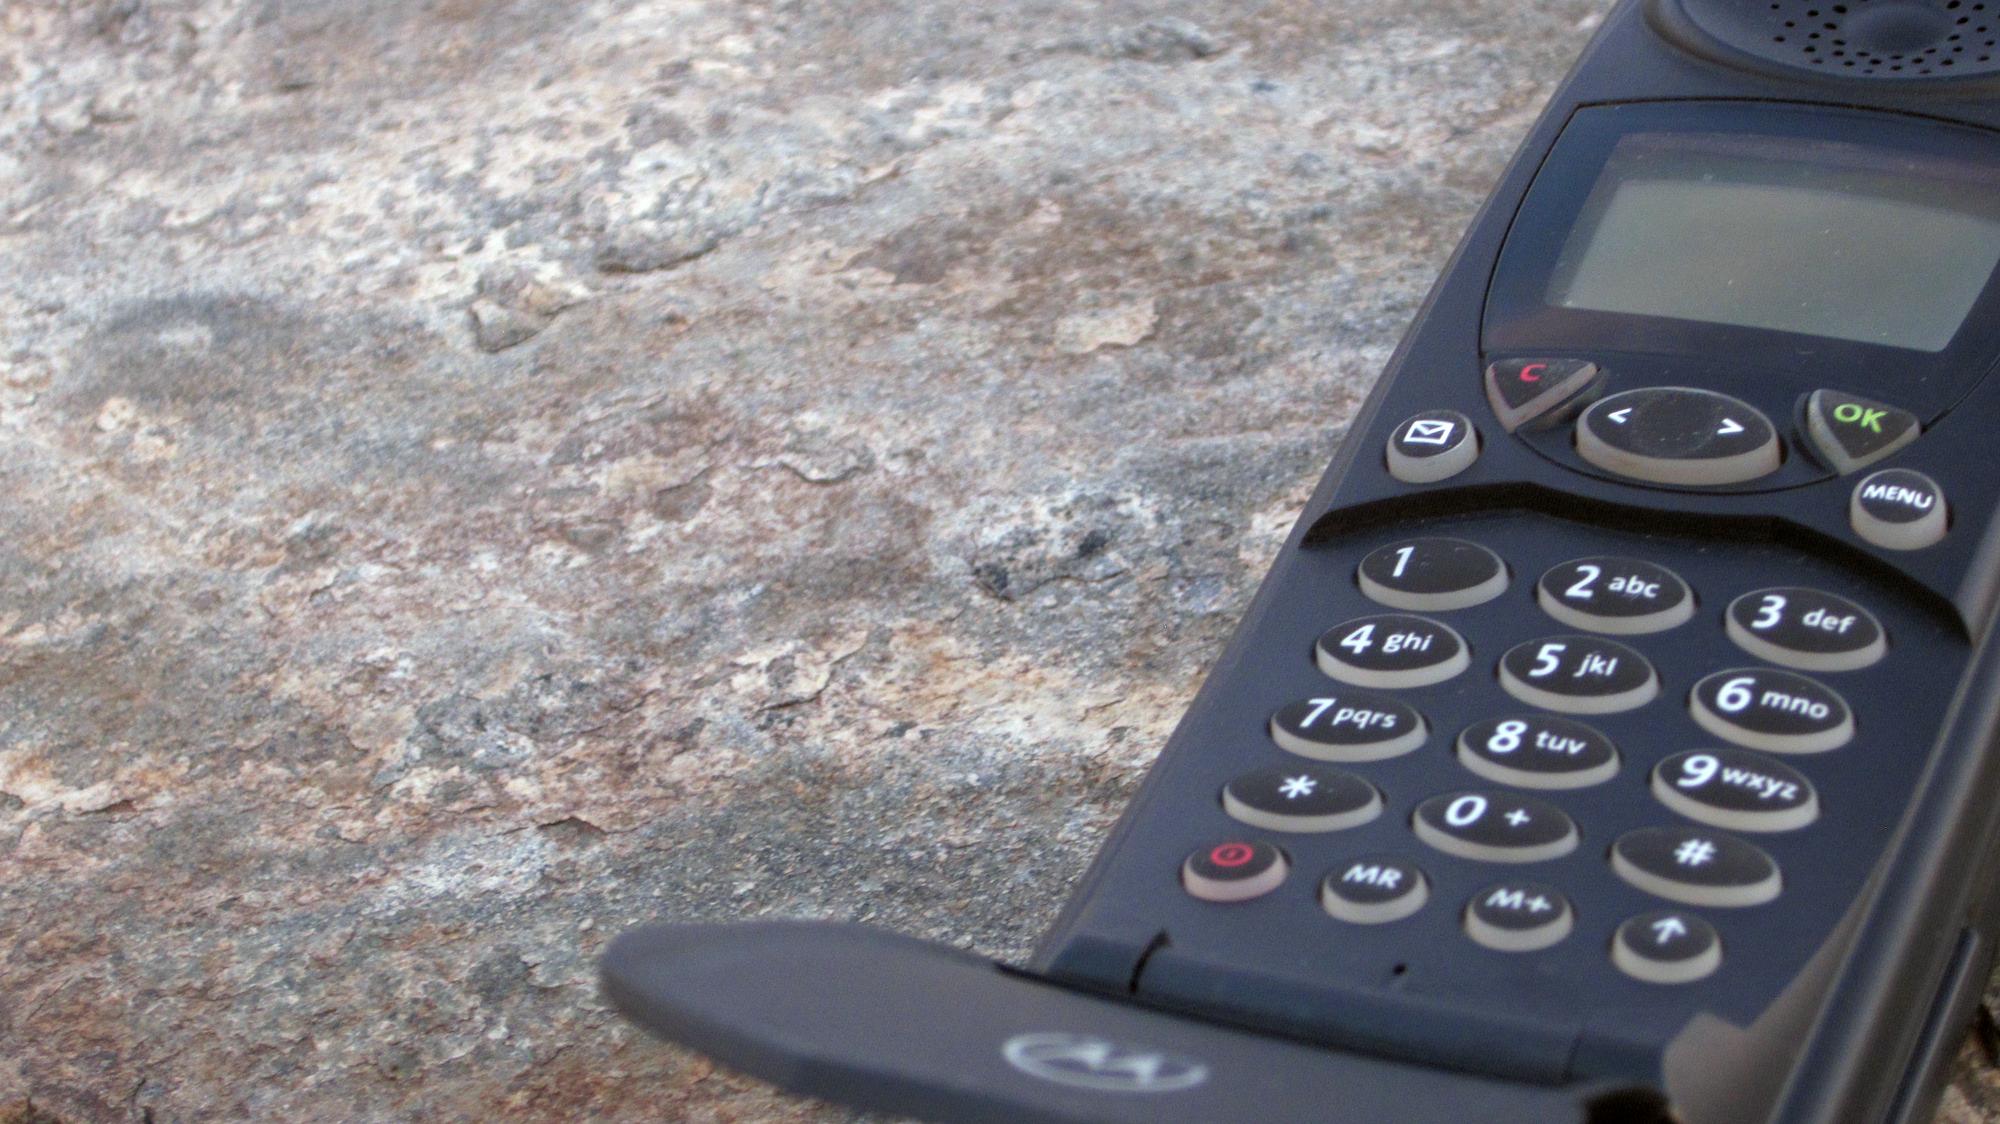 iridium-motorola-9500-sat-phone-laying-in-a-rock.png